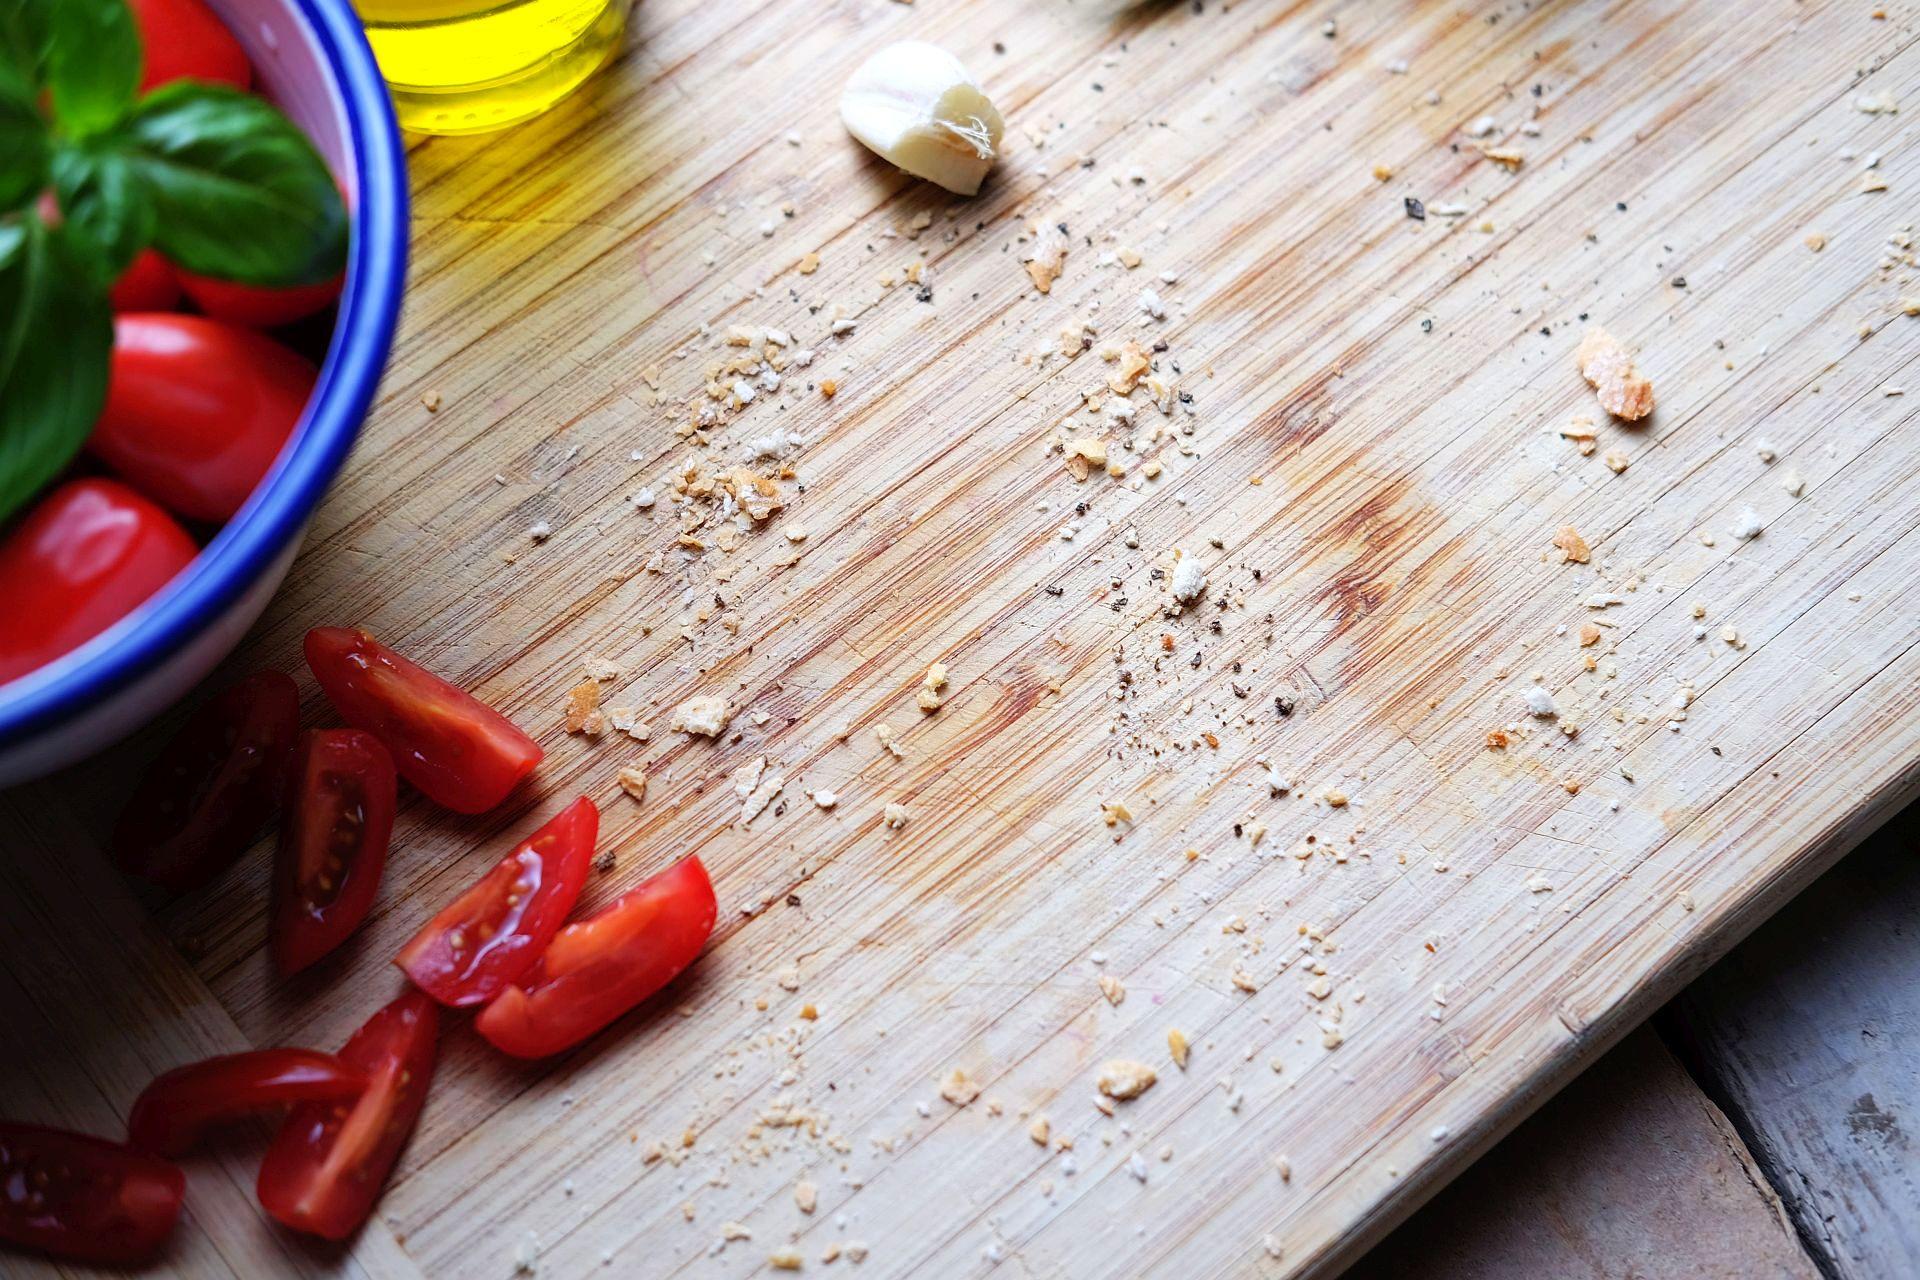 Buruschetta al pomodoro